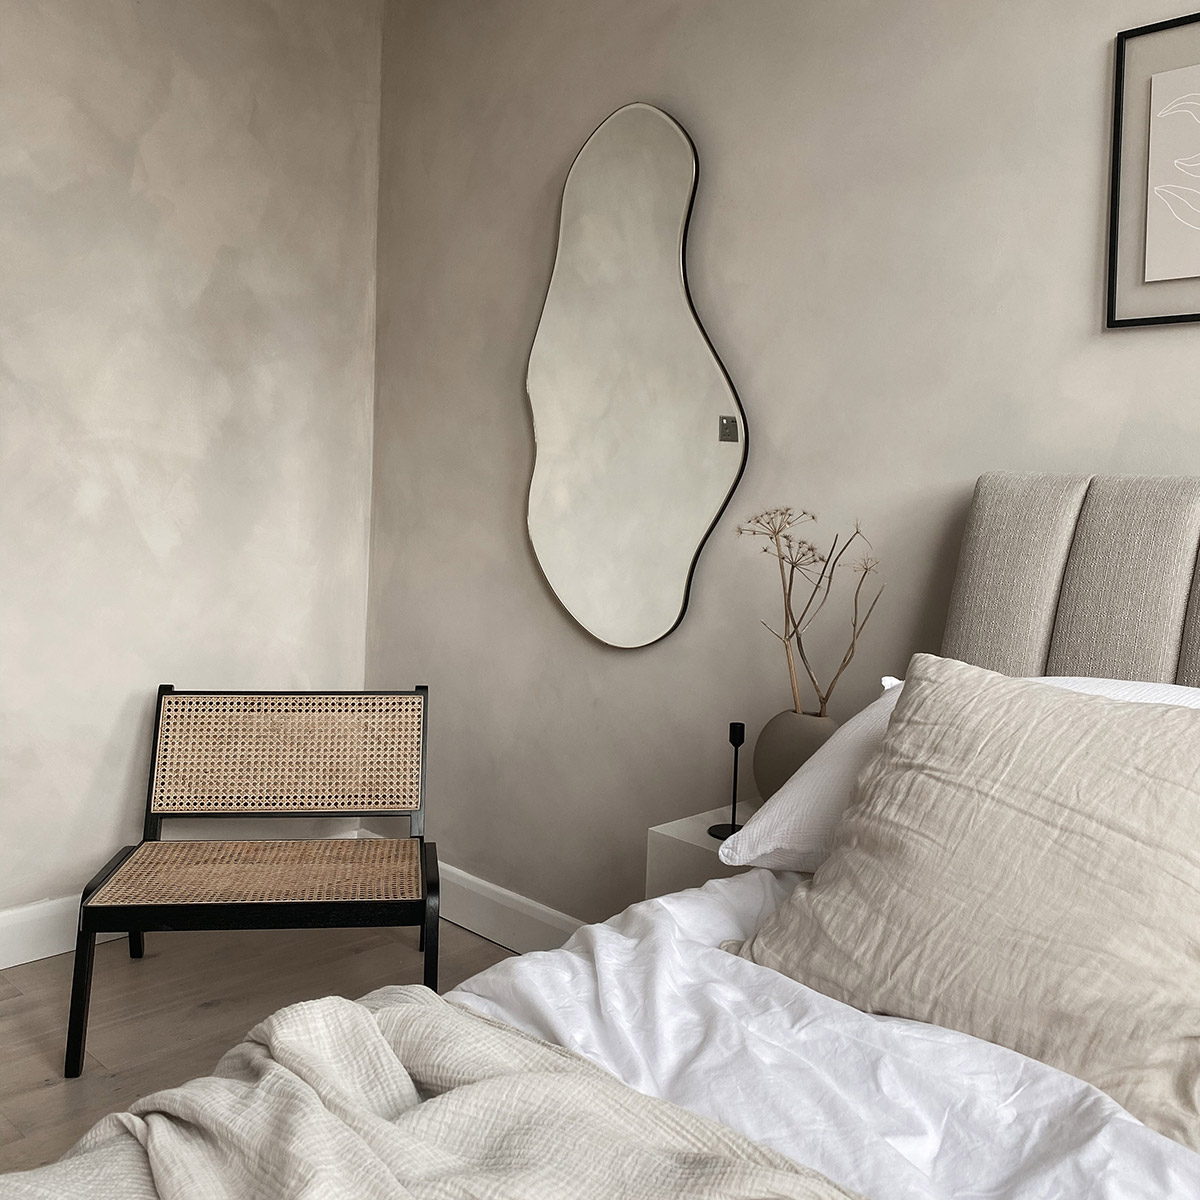 Ferm Living Pond Mirror in Lisa Mistry's neutral bedroom